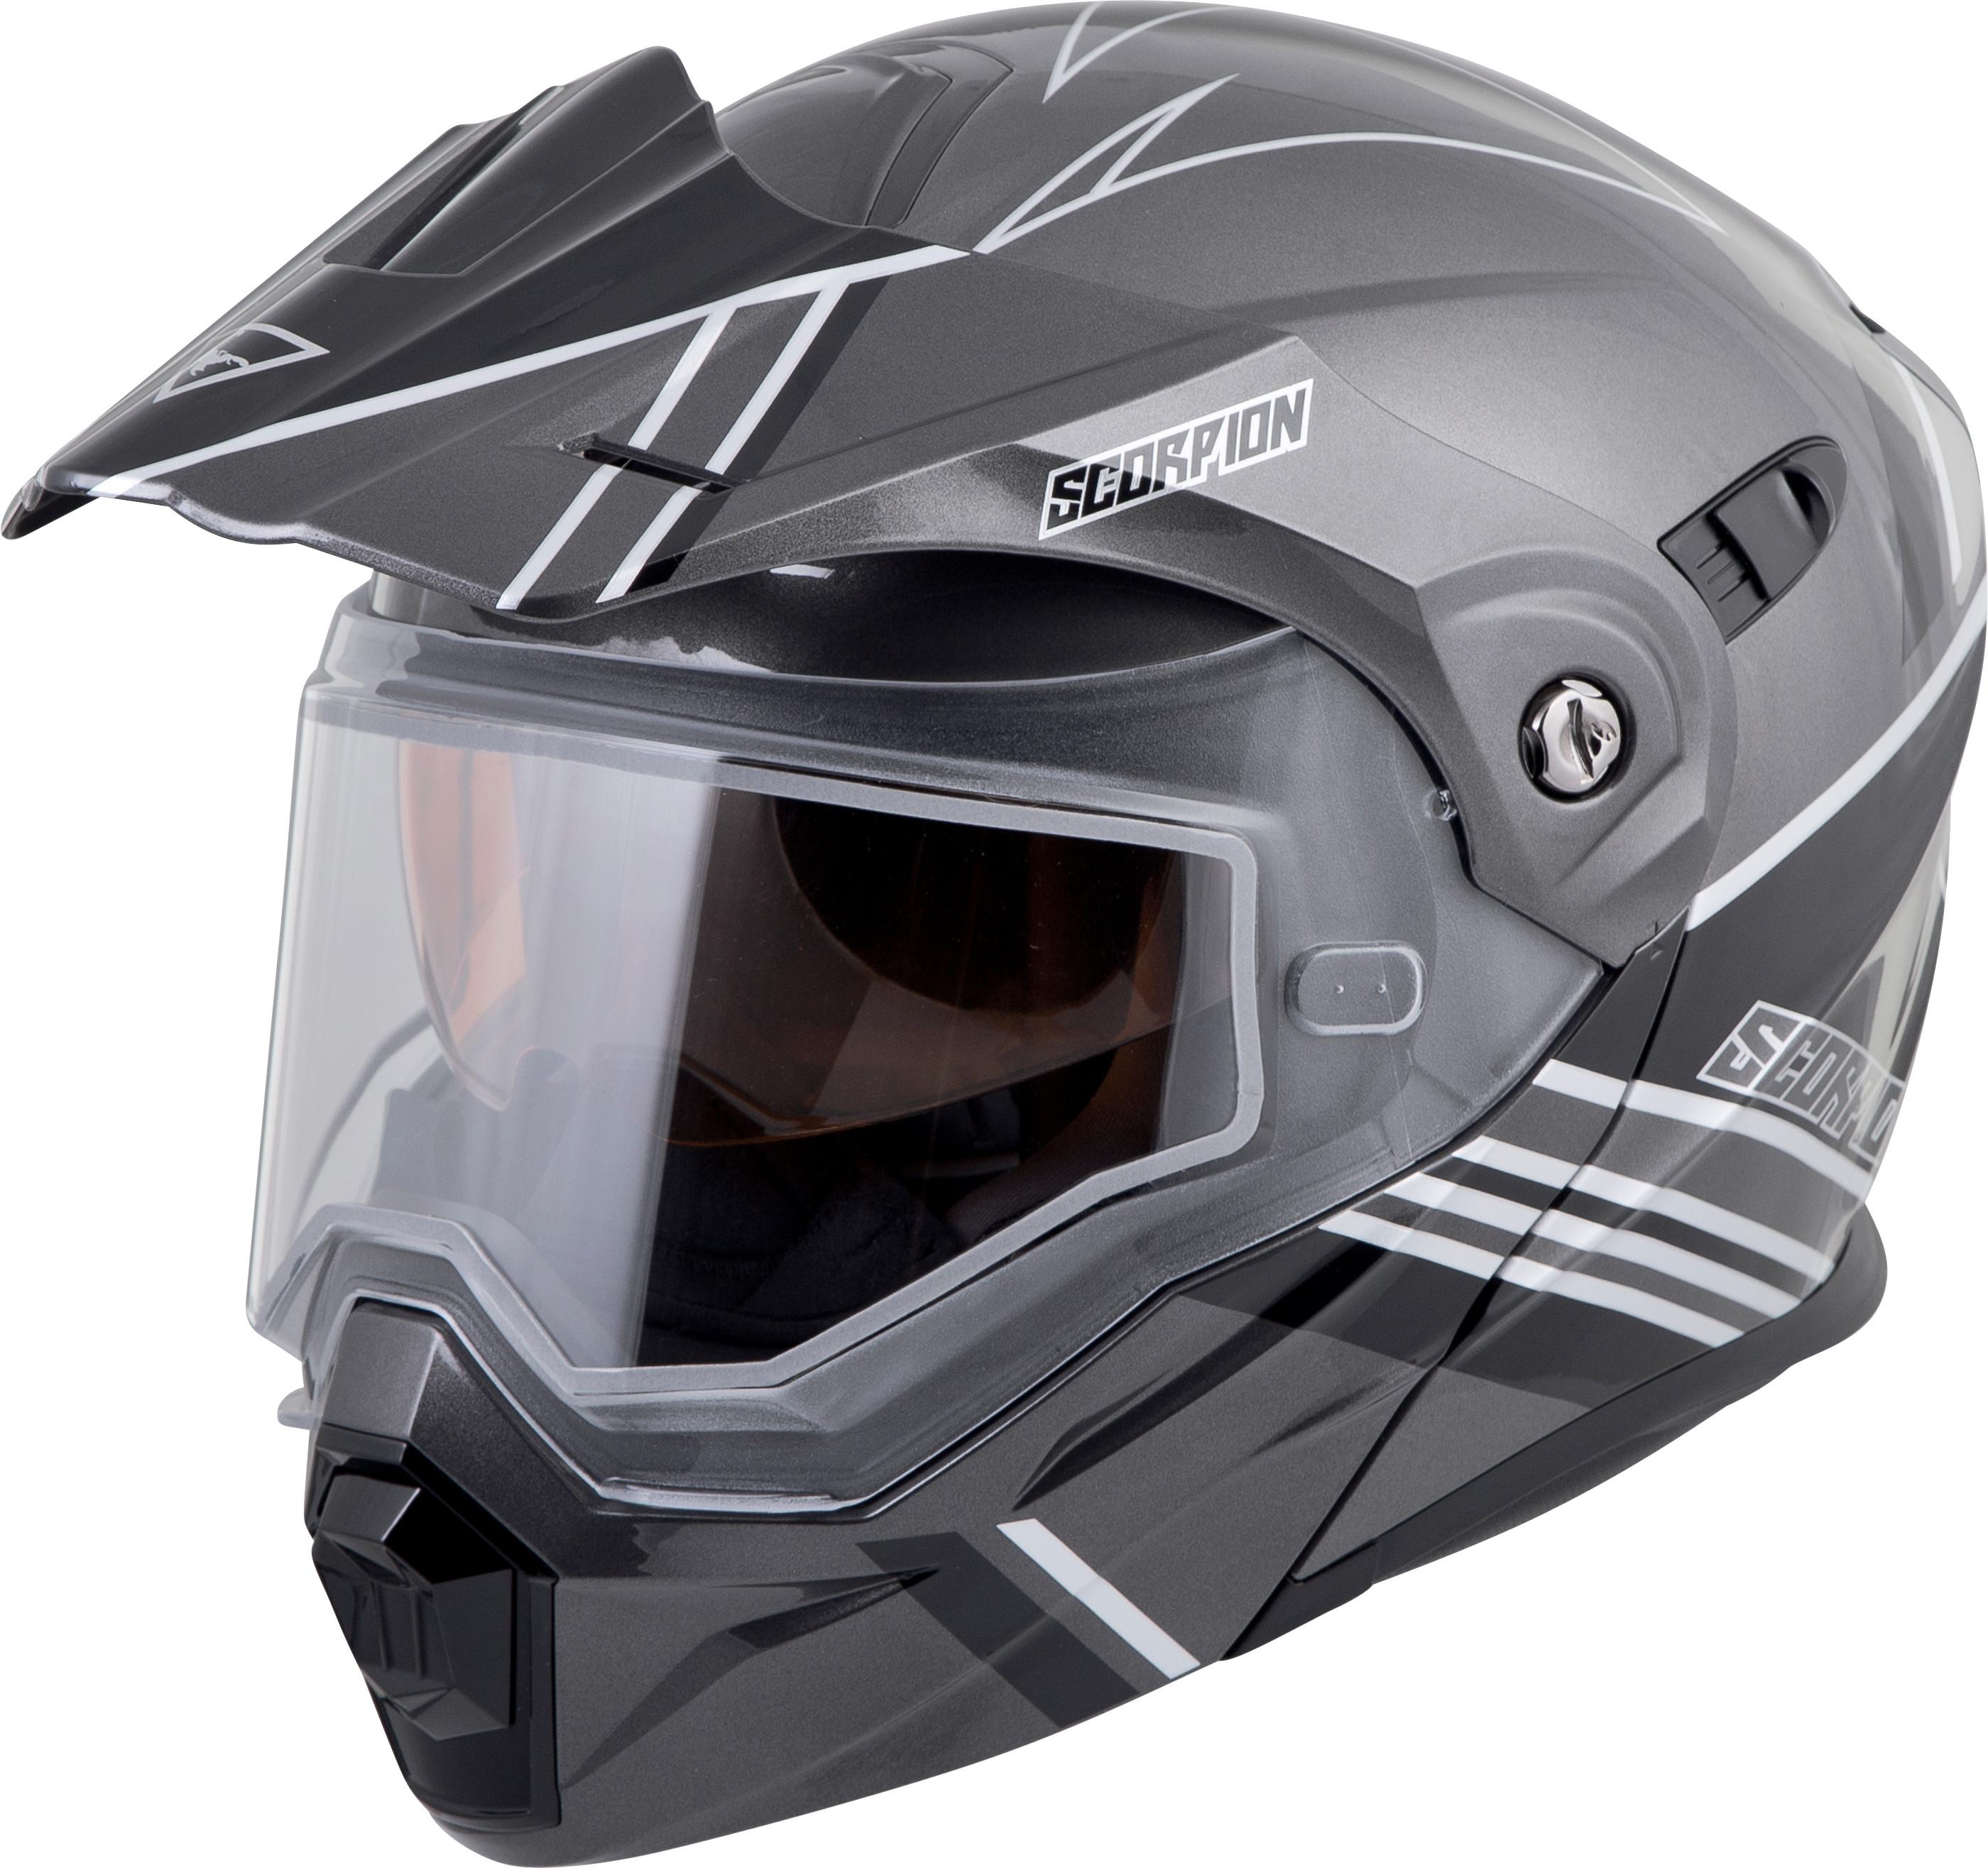 79f0808f EXO-AT950 TETON Cold Weather, Helmet BLACK SILVER 75-15103X